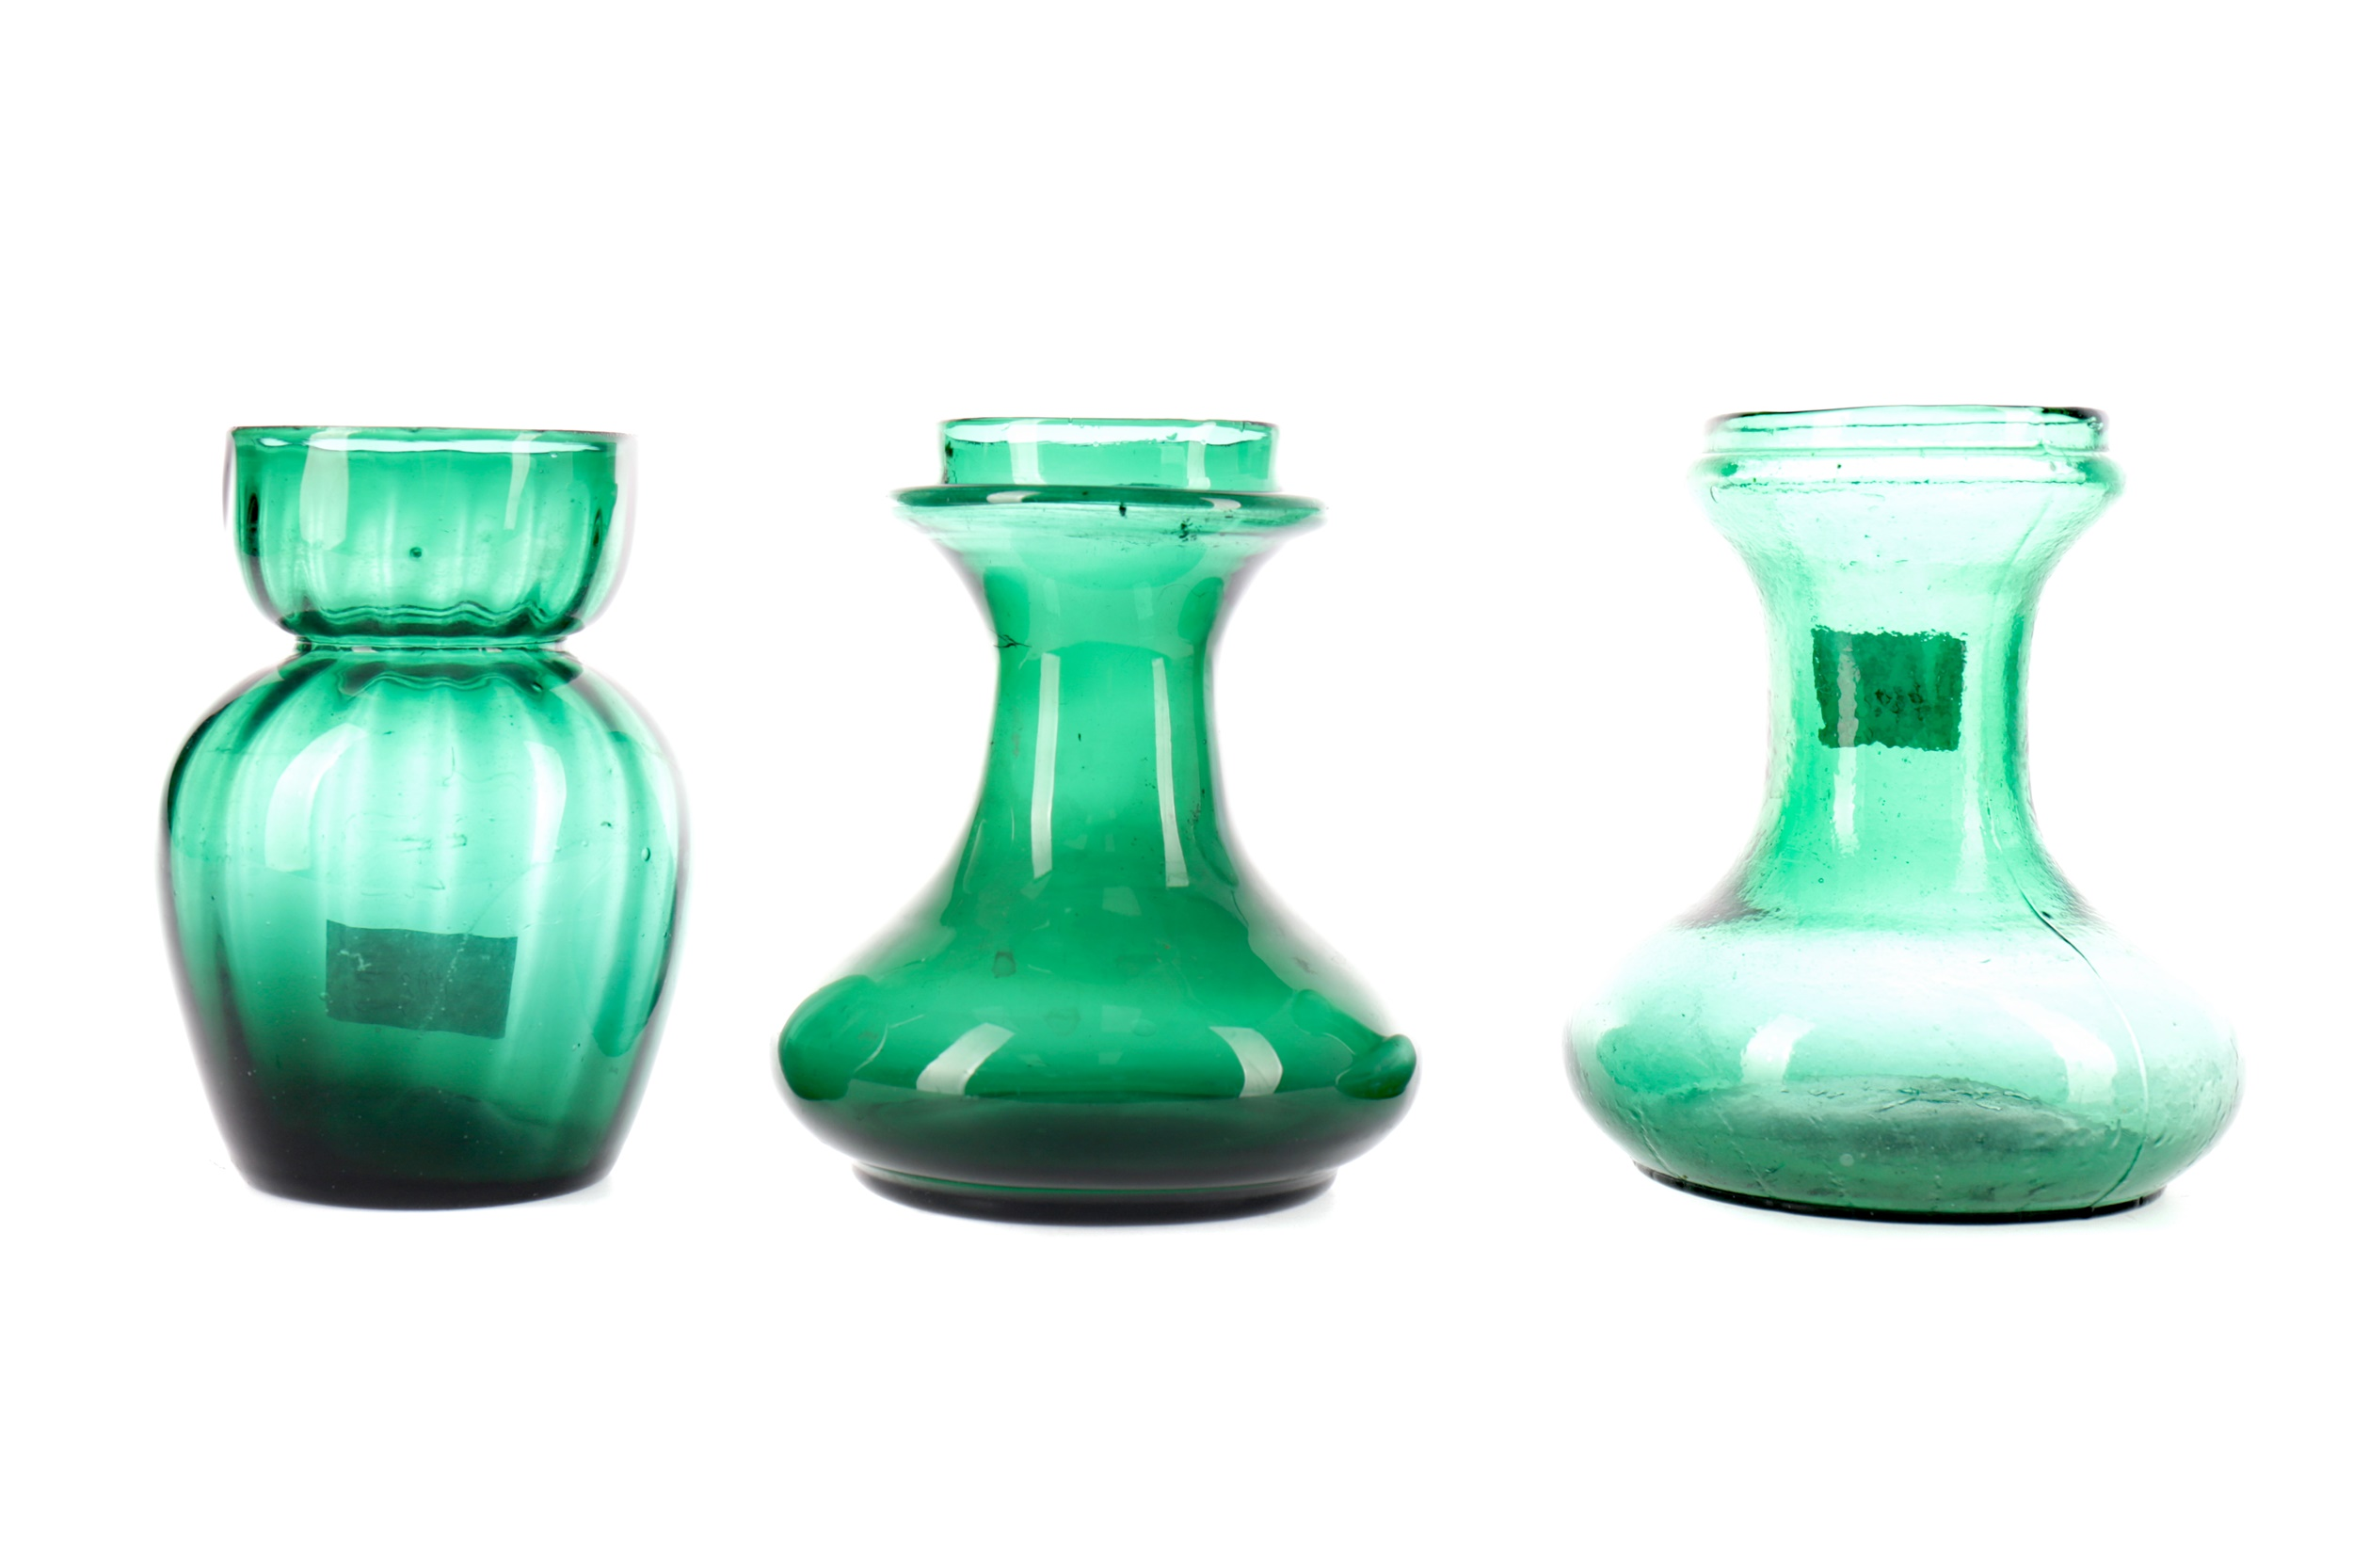 THREE LATE VICTORIAN GLASS VASES